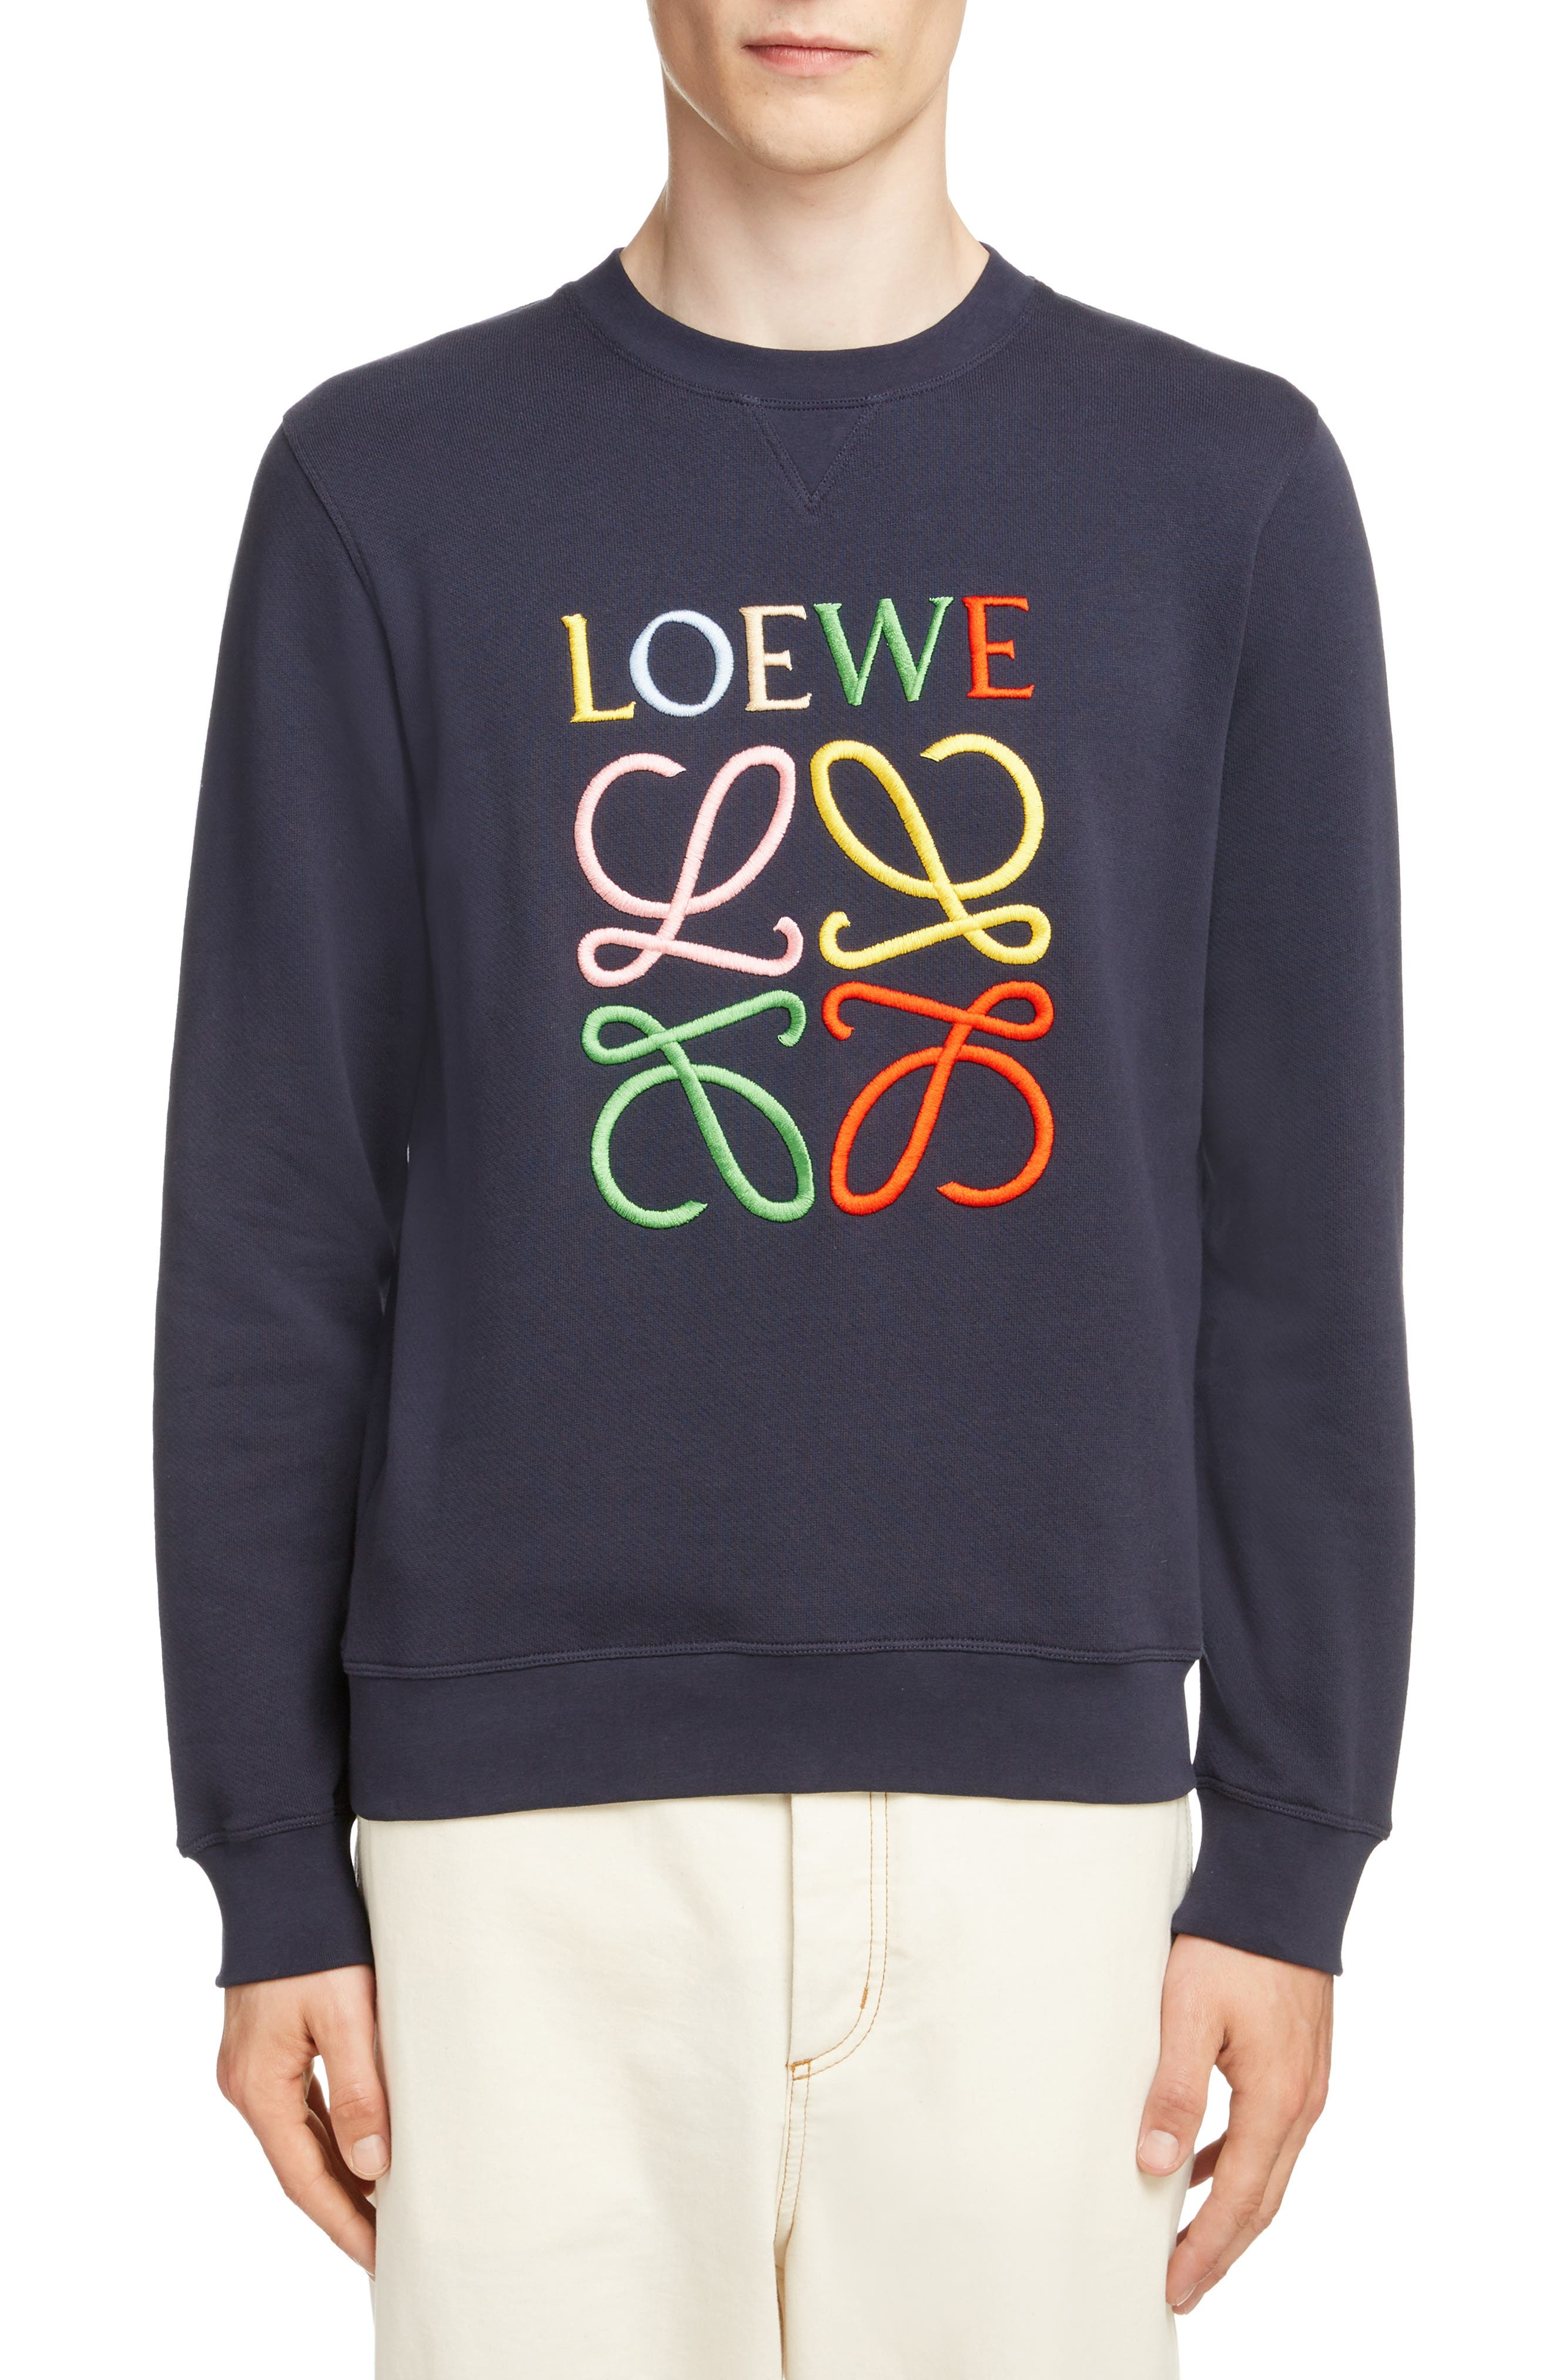 LOEWE, Anagram Sweatshirt, Main thumbnail 1, color, 5387-NAVY BLUE/ MULTICOLOR